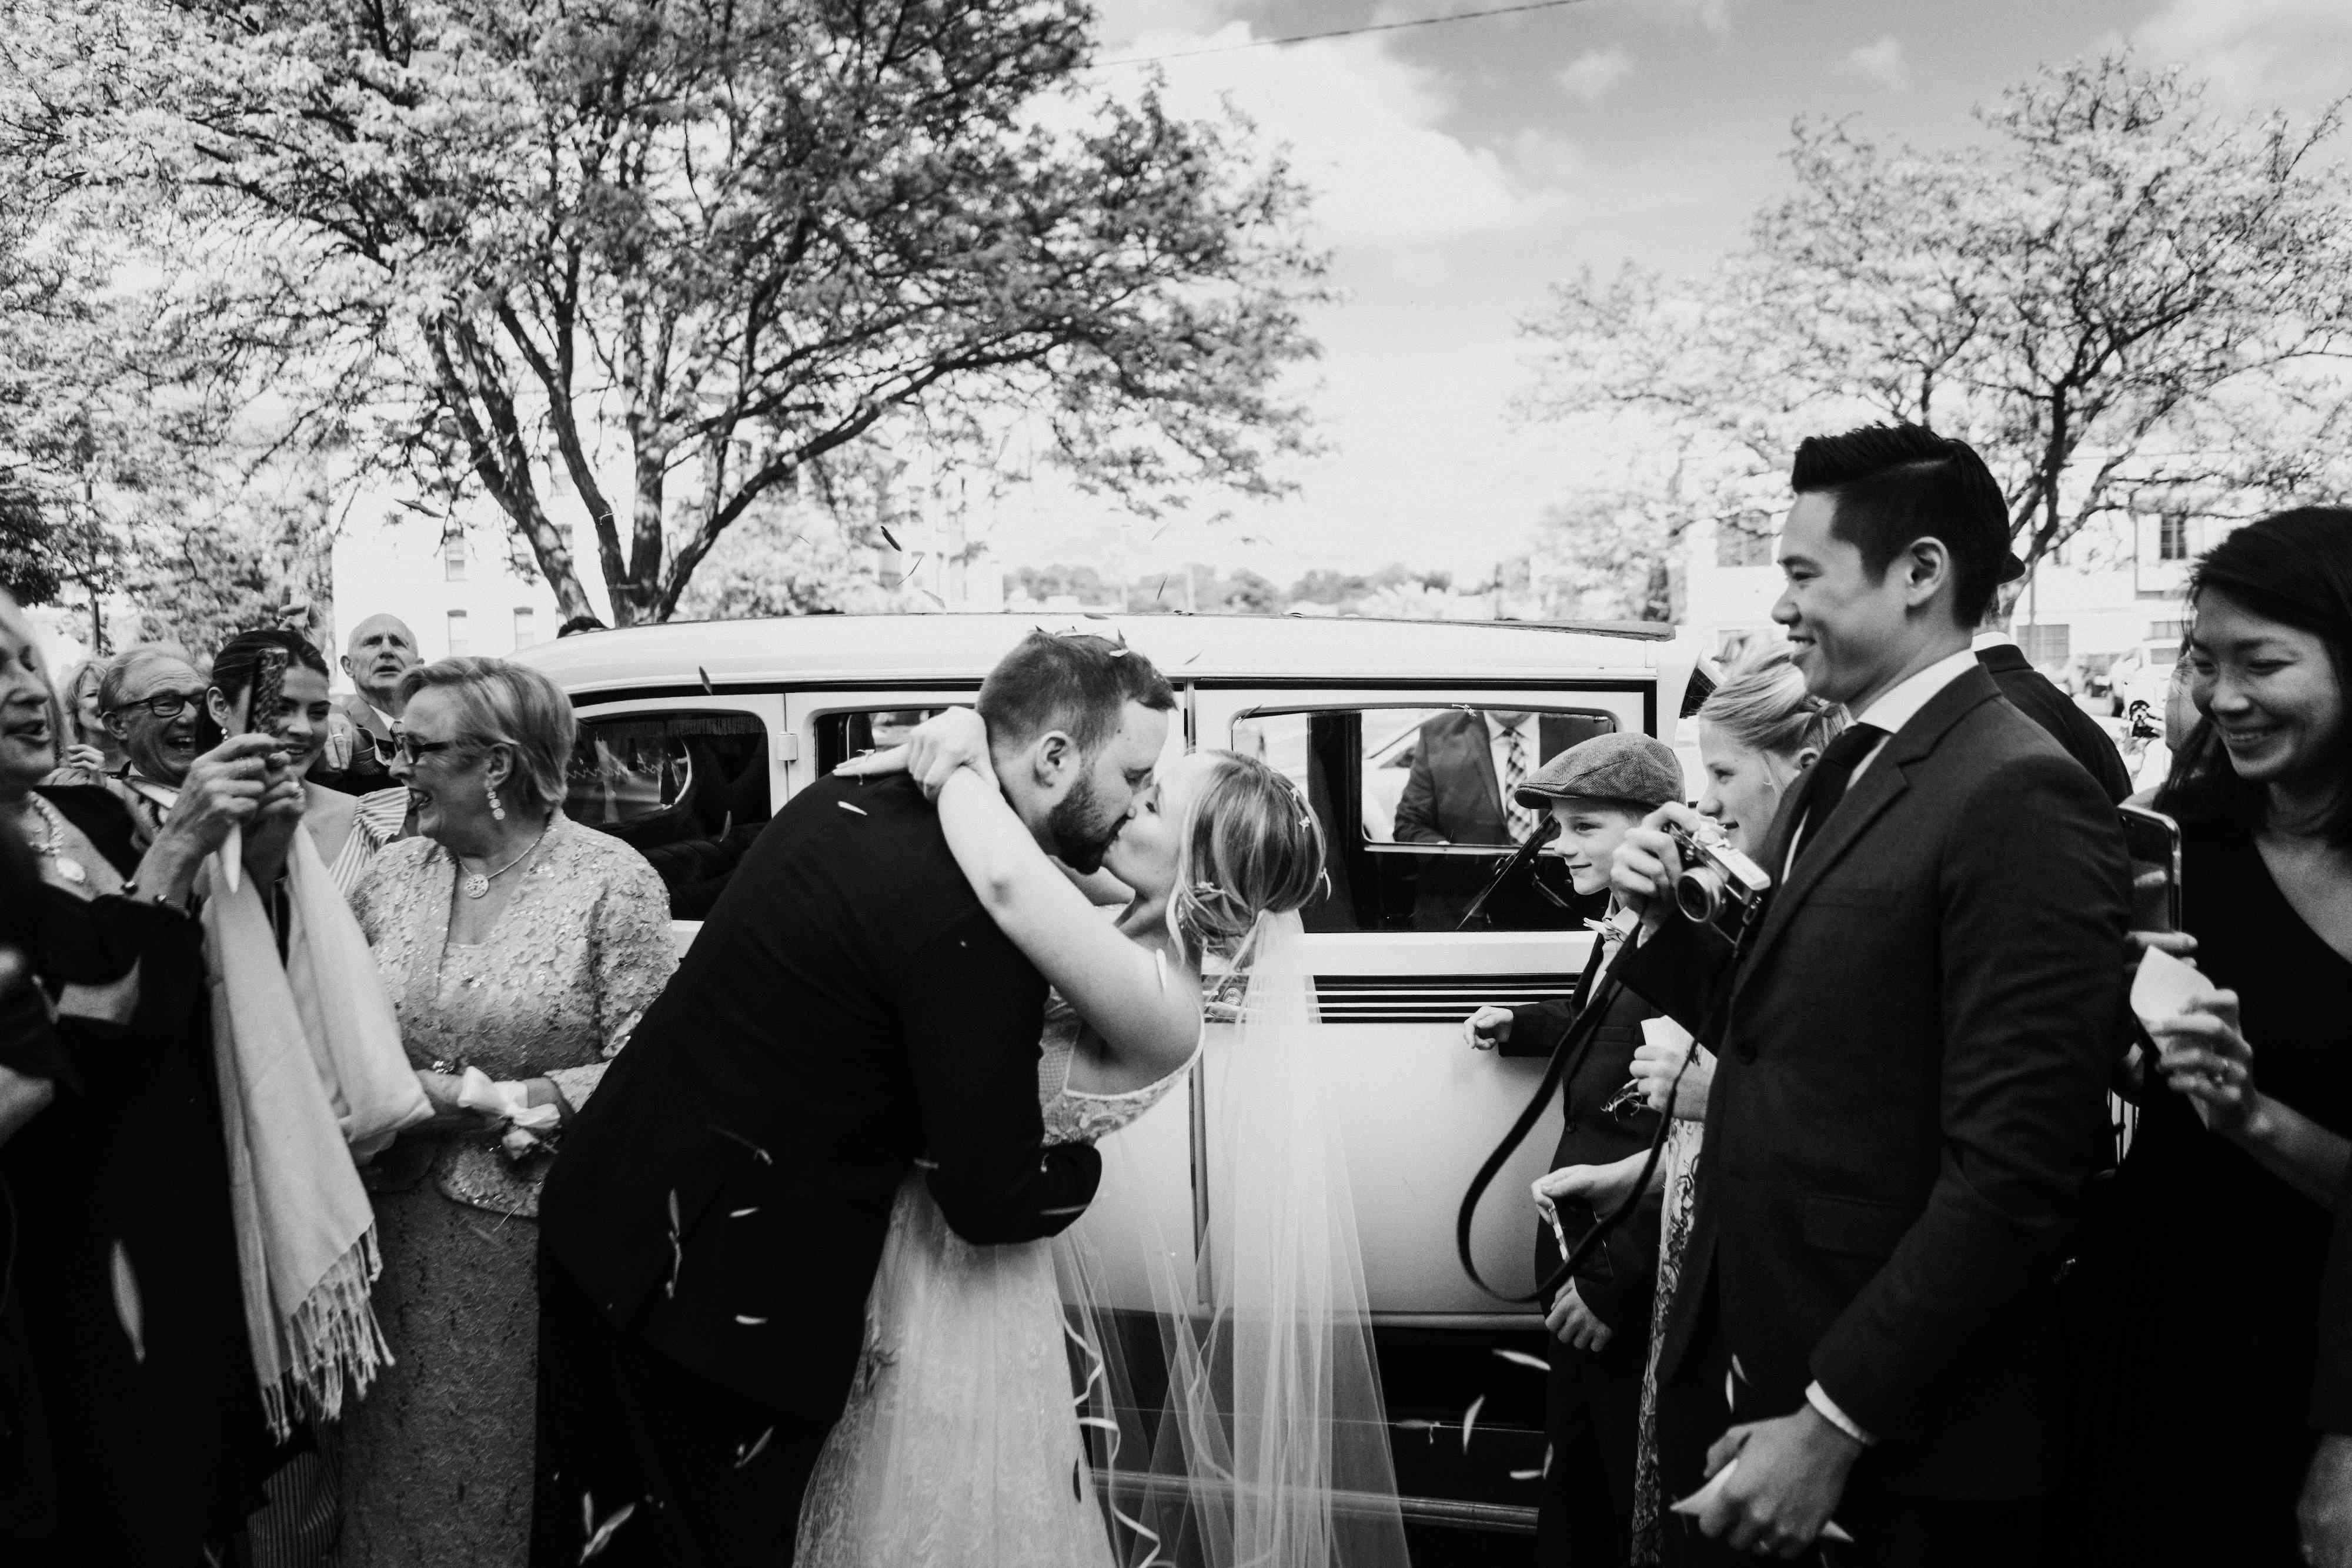 newlywed weddings kissing